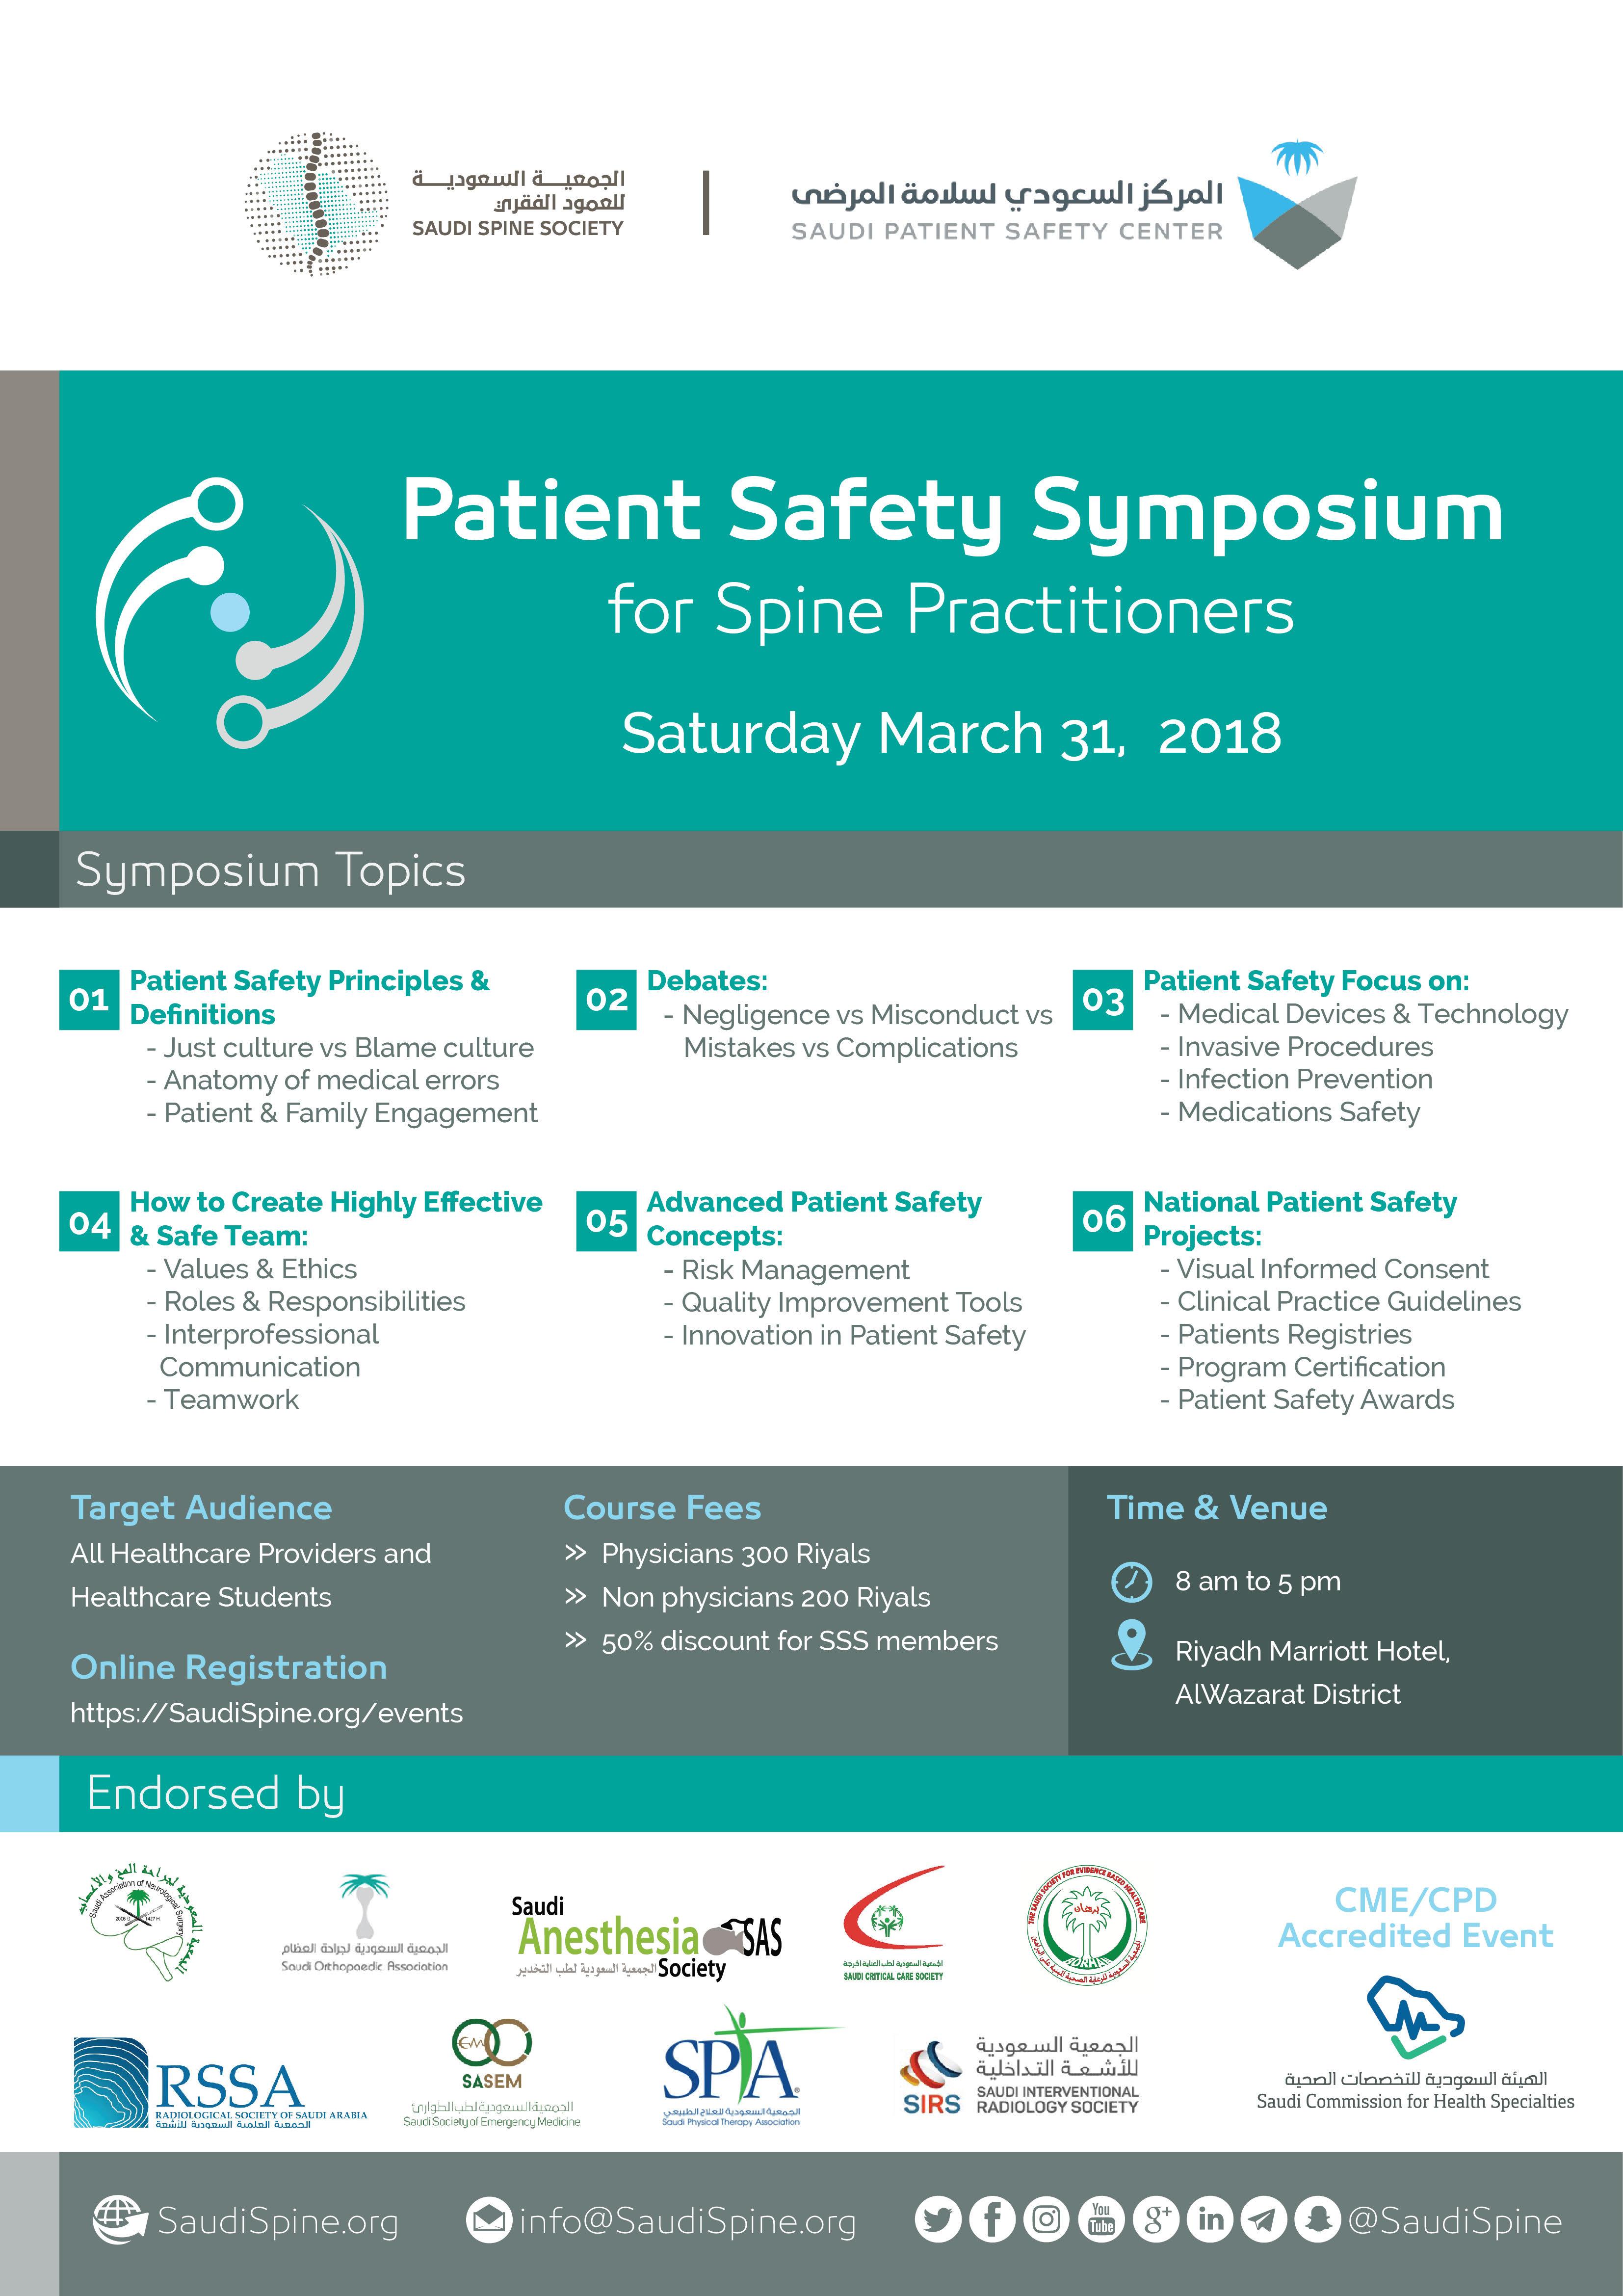 Patient Safety Symposium